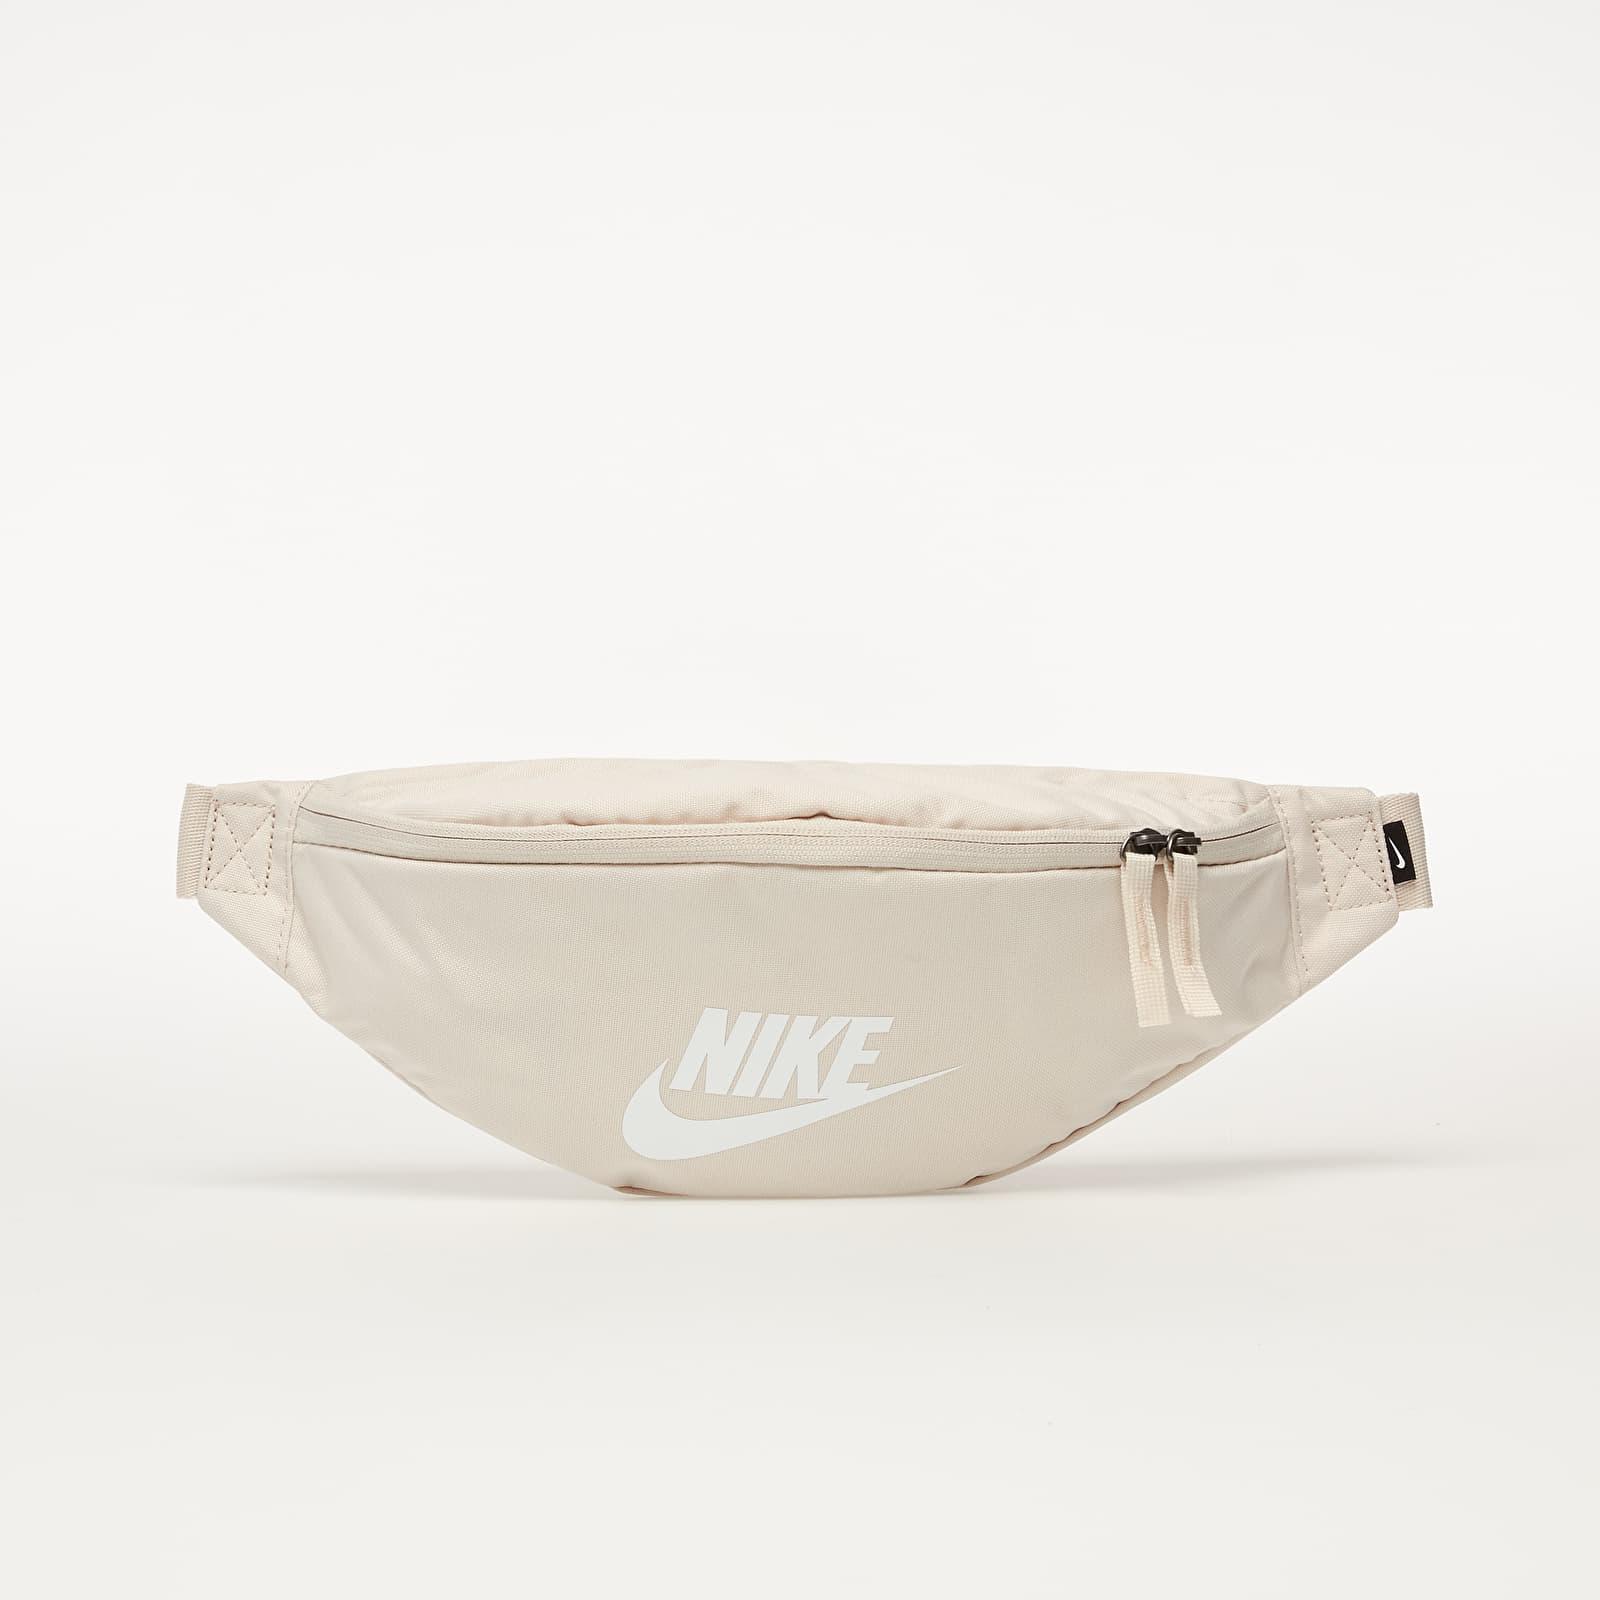 Övtáska Nike Sportswear Heritage Hip Pack Lt Orewood Brn/ Lt Orewood Brn/ White